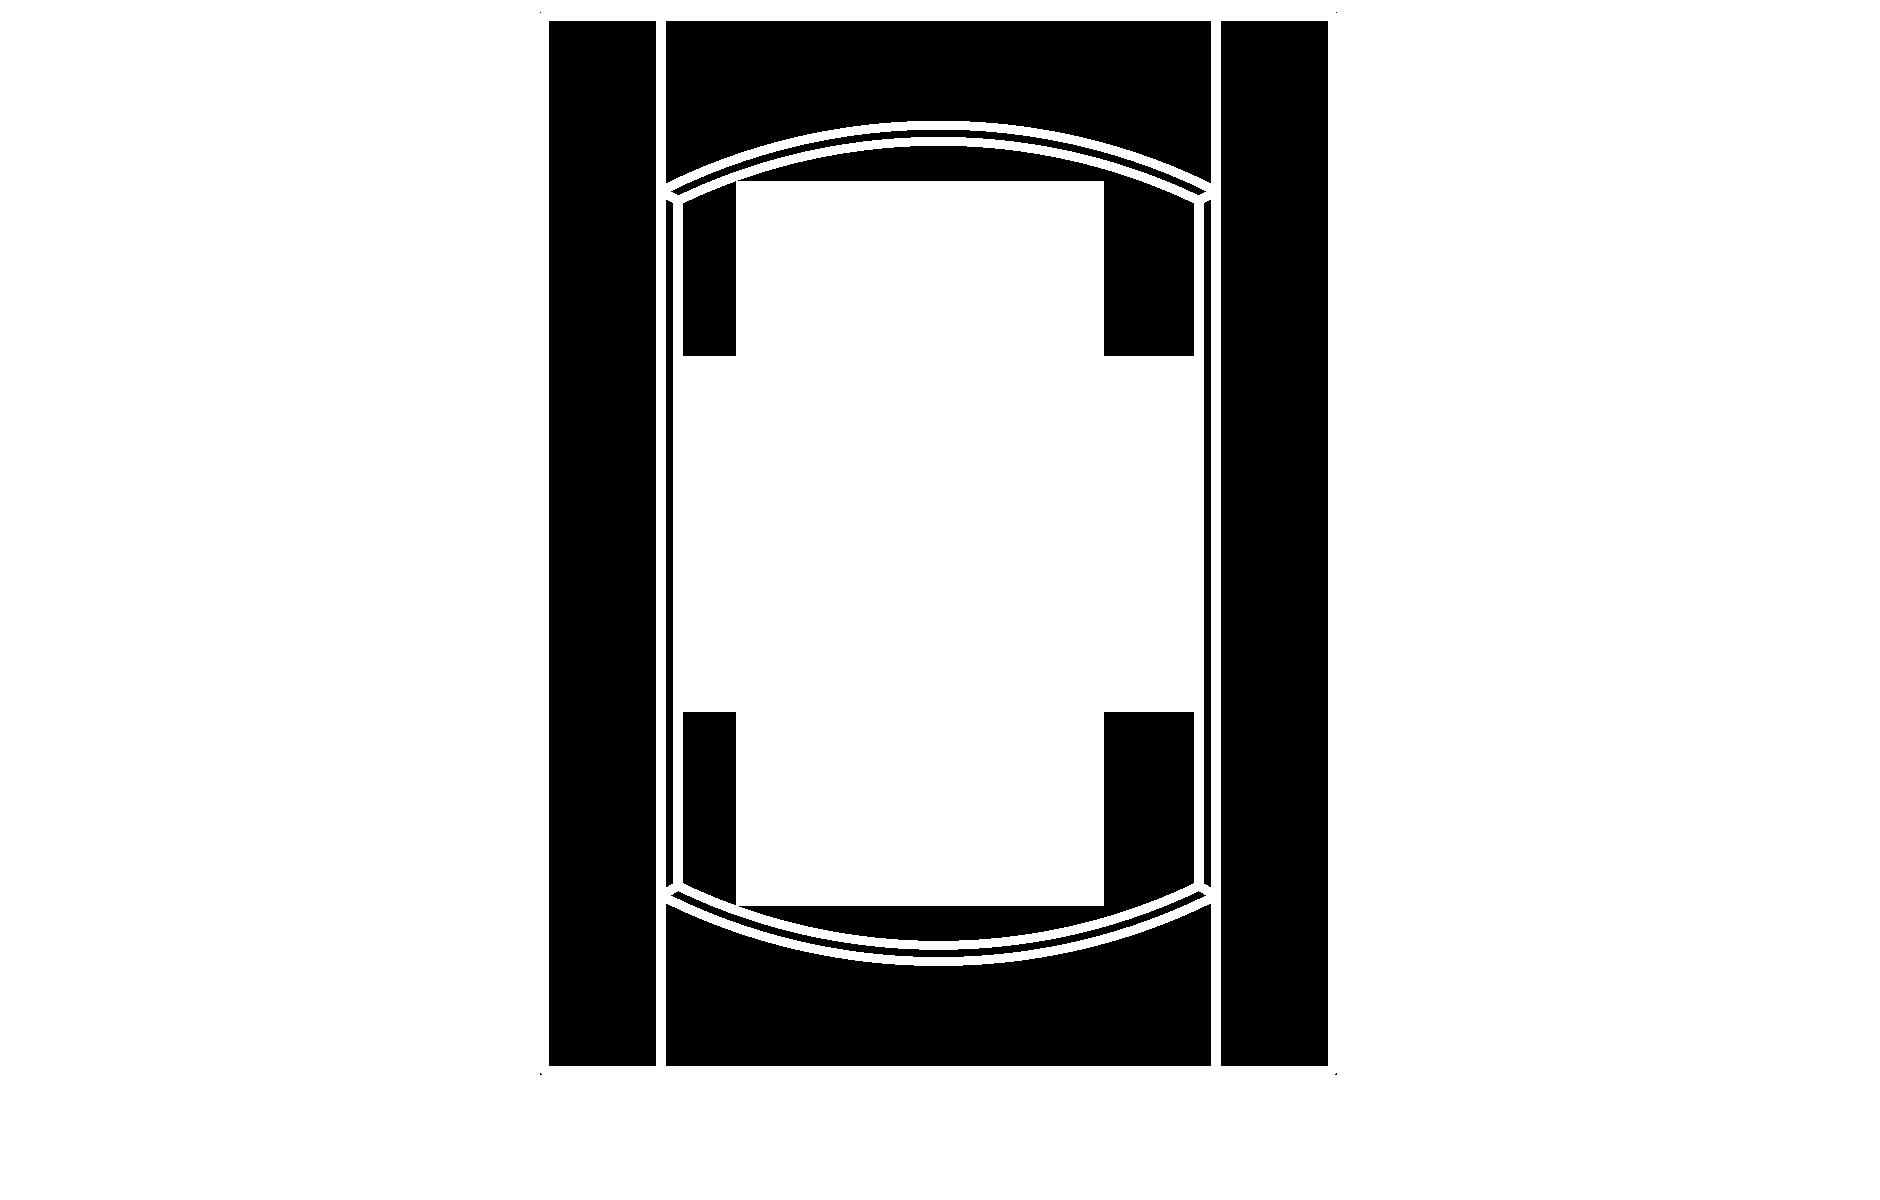 C122 cope and stick cabinet door configuration